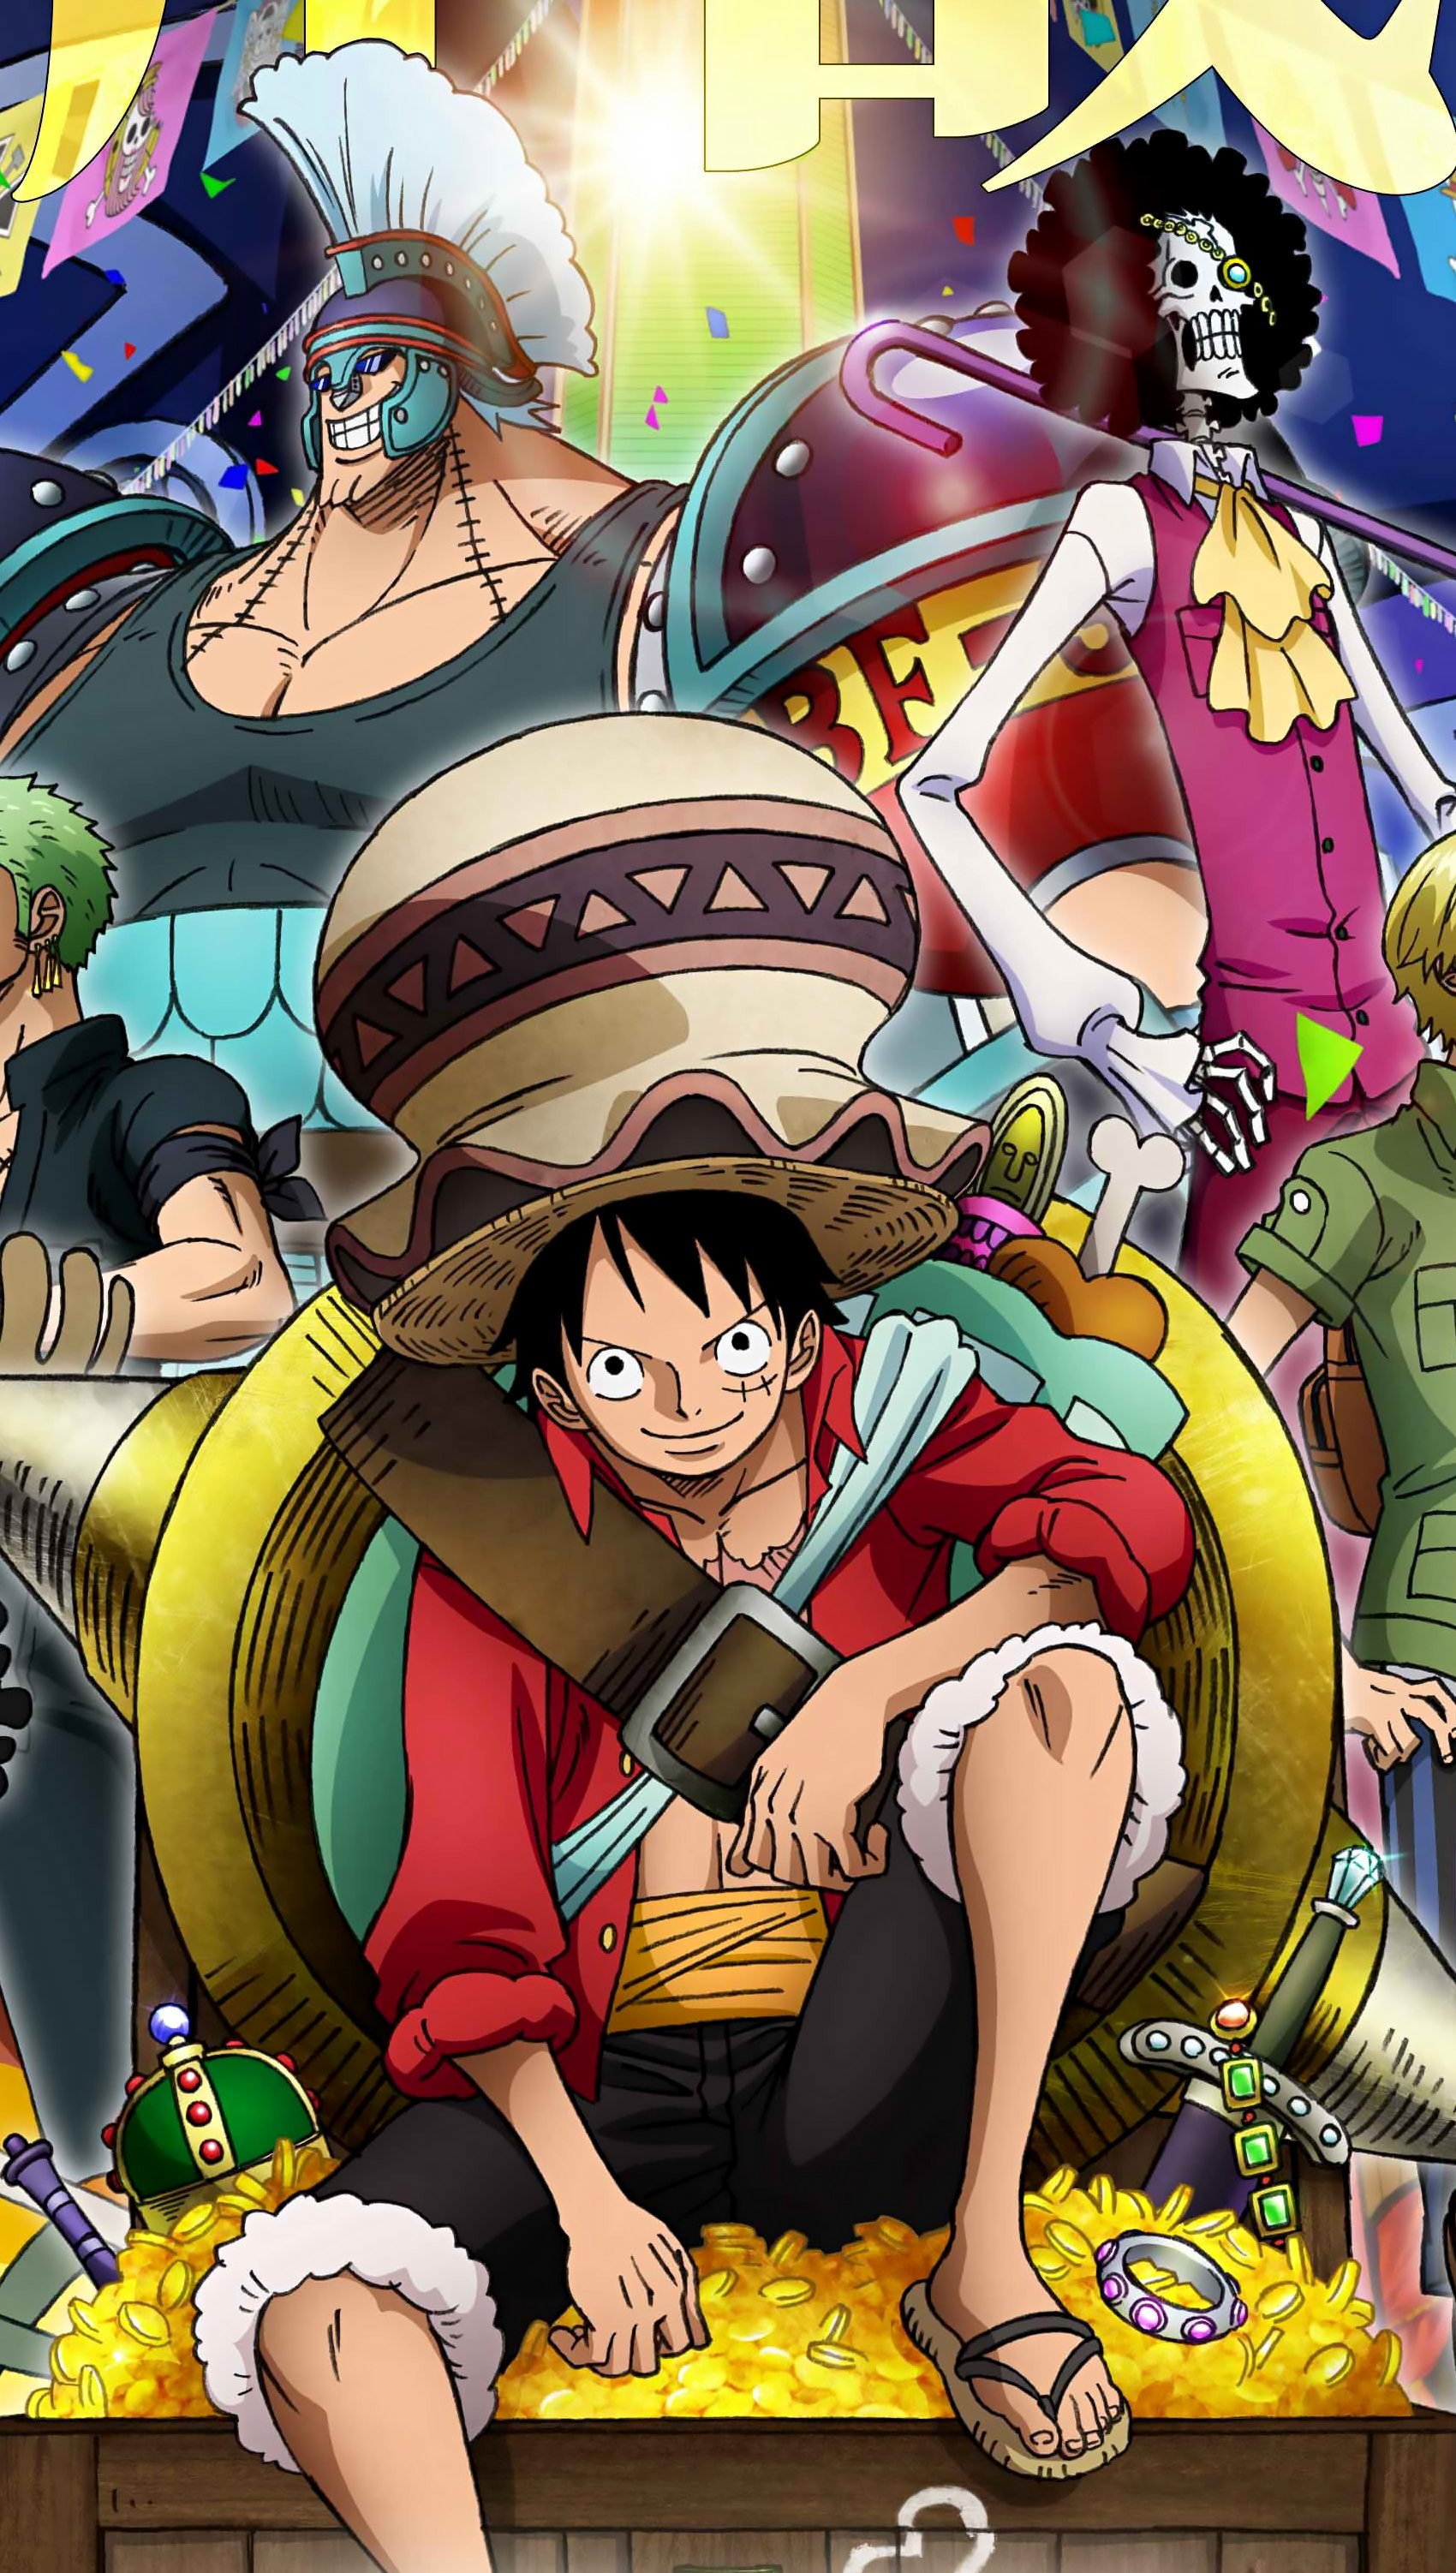 Fondos de pantalla Anime One Piece Personajes Vertical